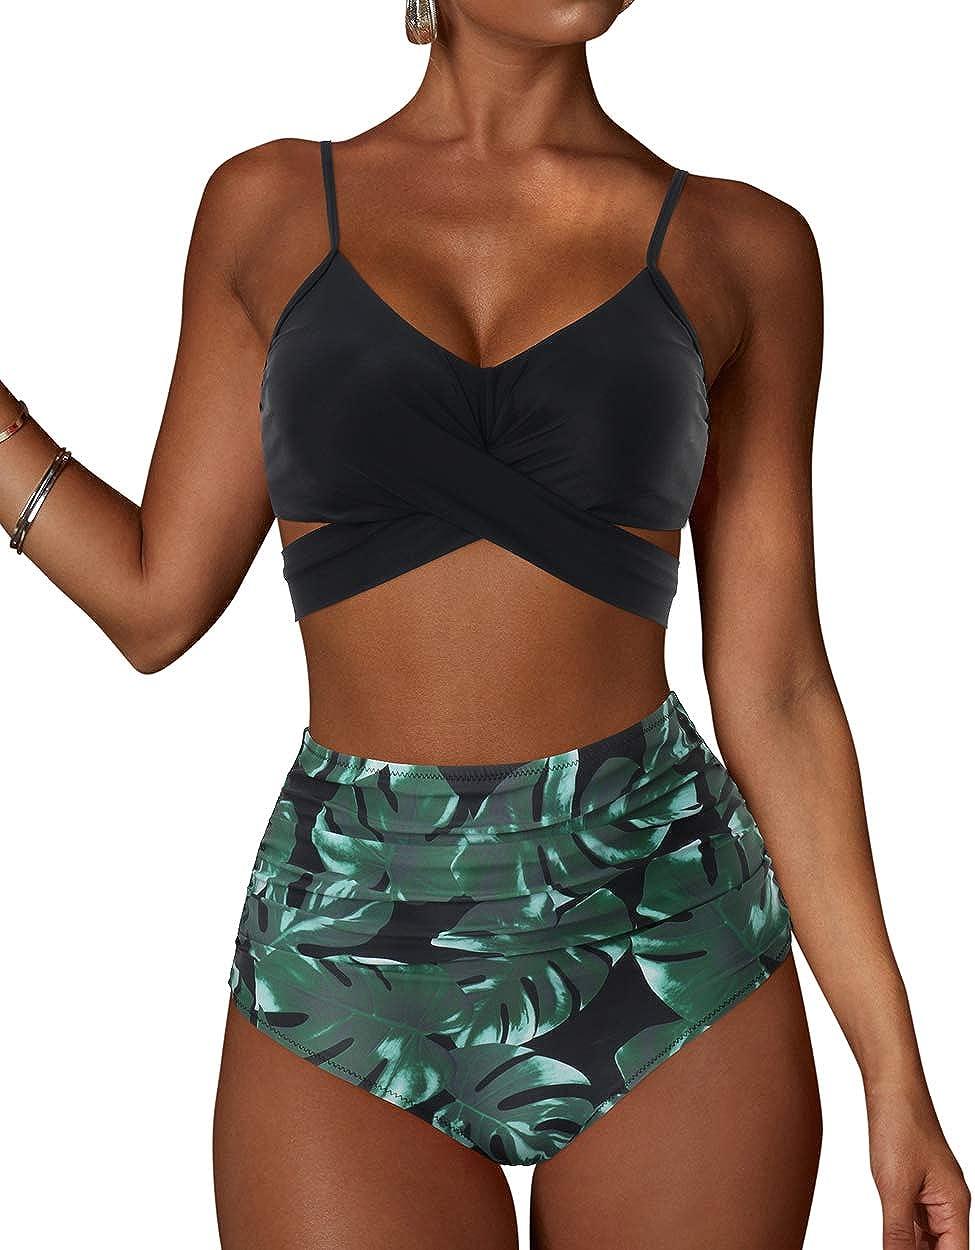 Wome Criss Cross Swimwear Push Up Bandage Bikini 2 Piece Suit Halter Tankini